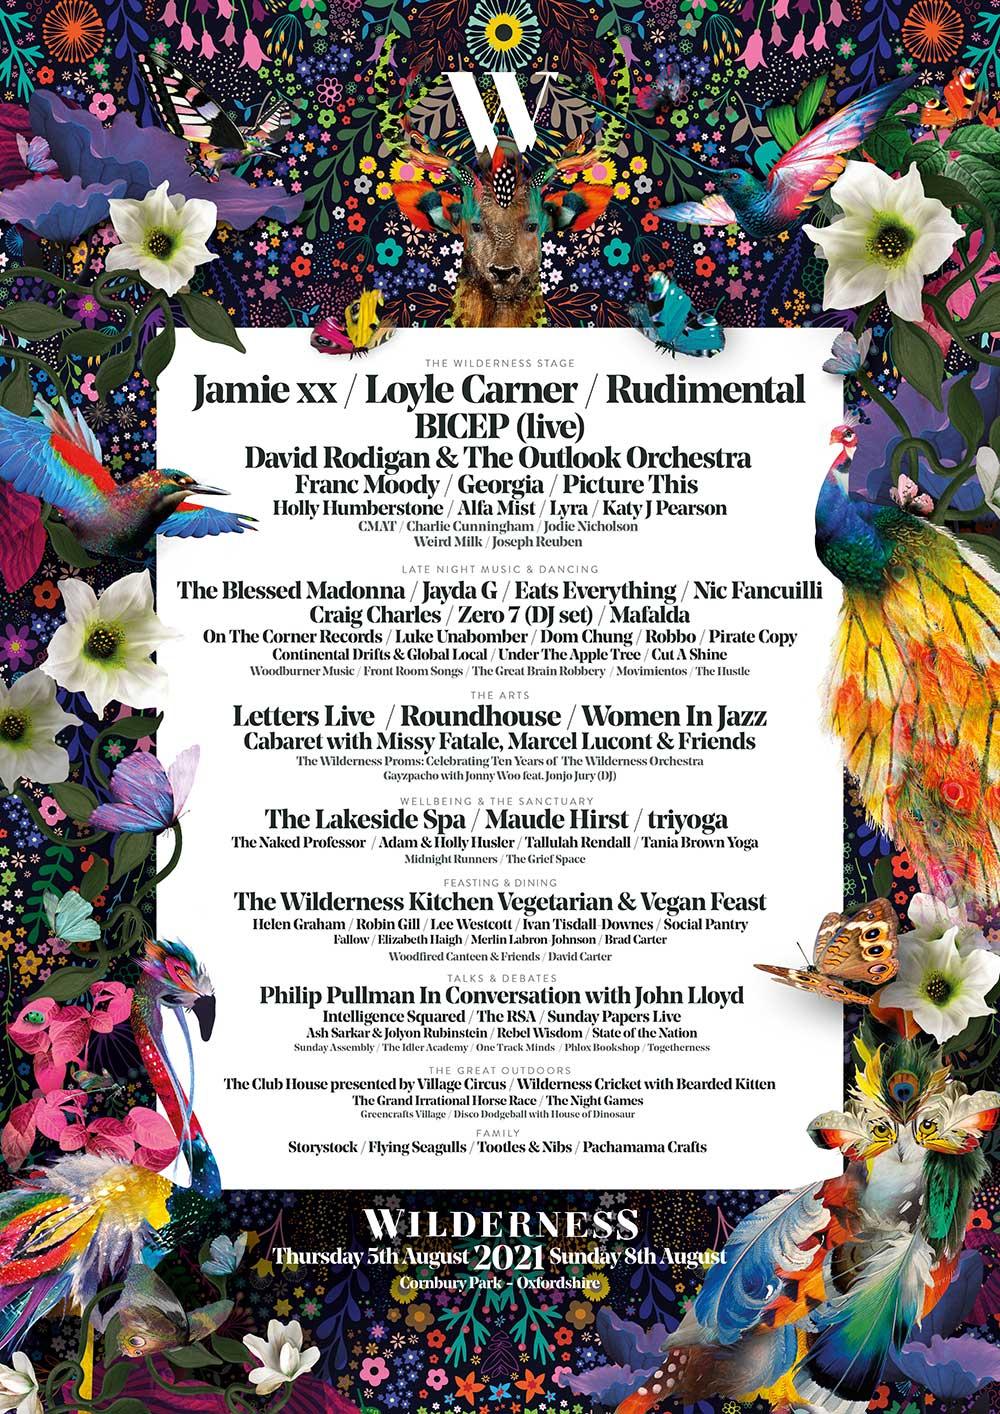 Wilderness Festival 2021 Line-up Poster